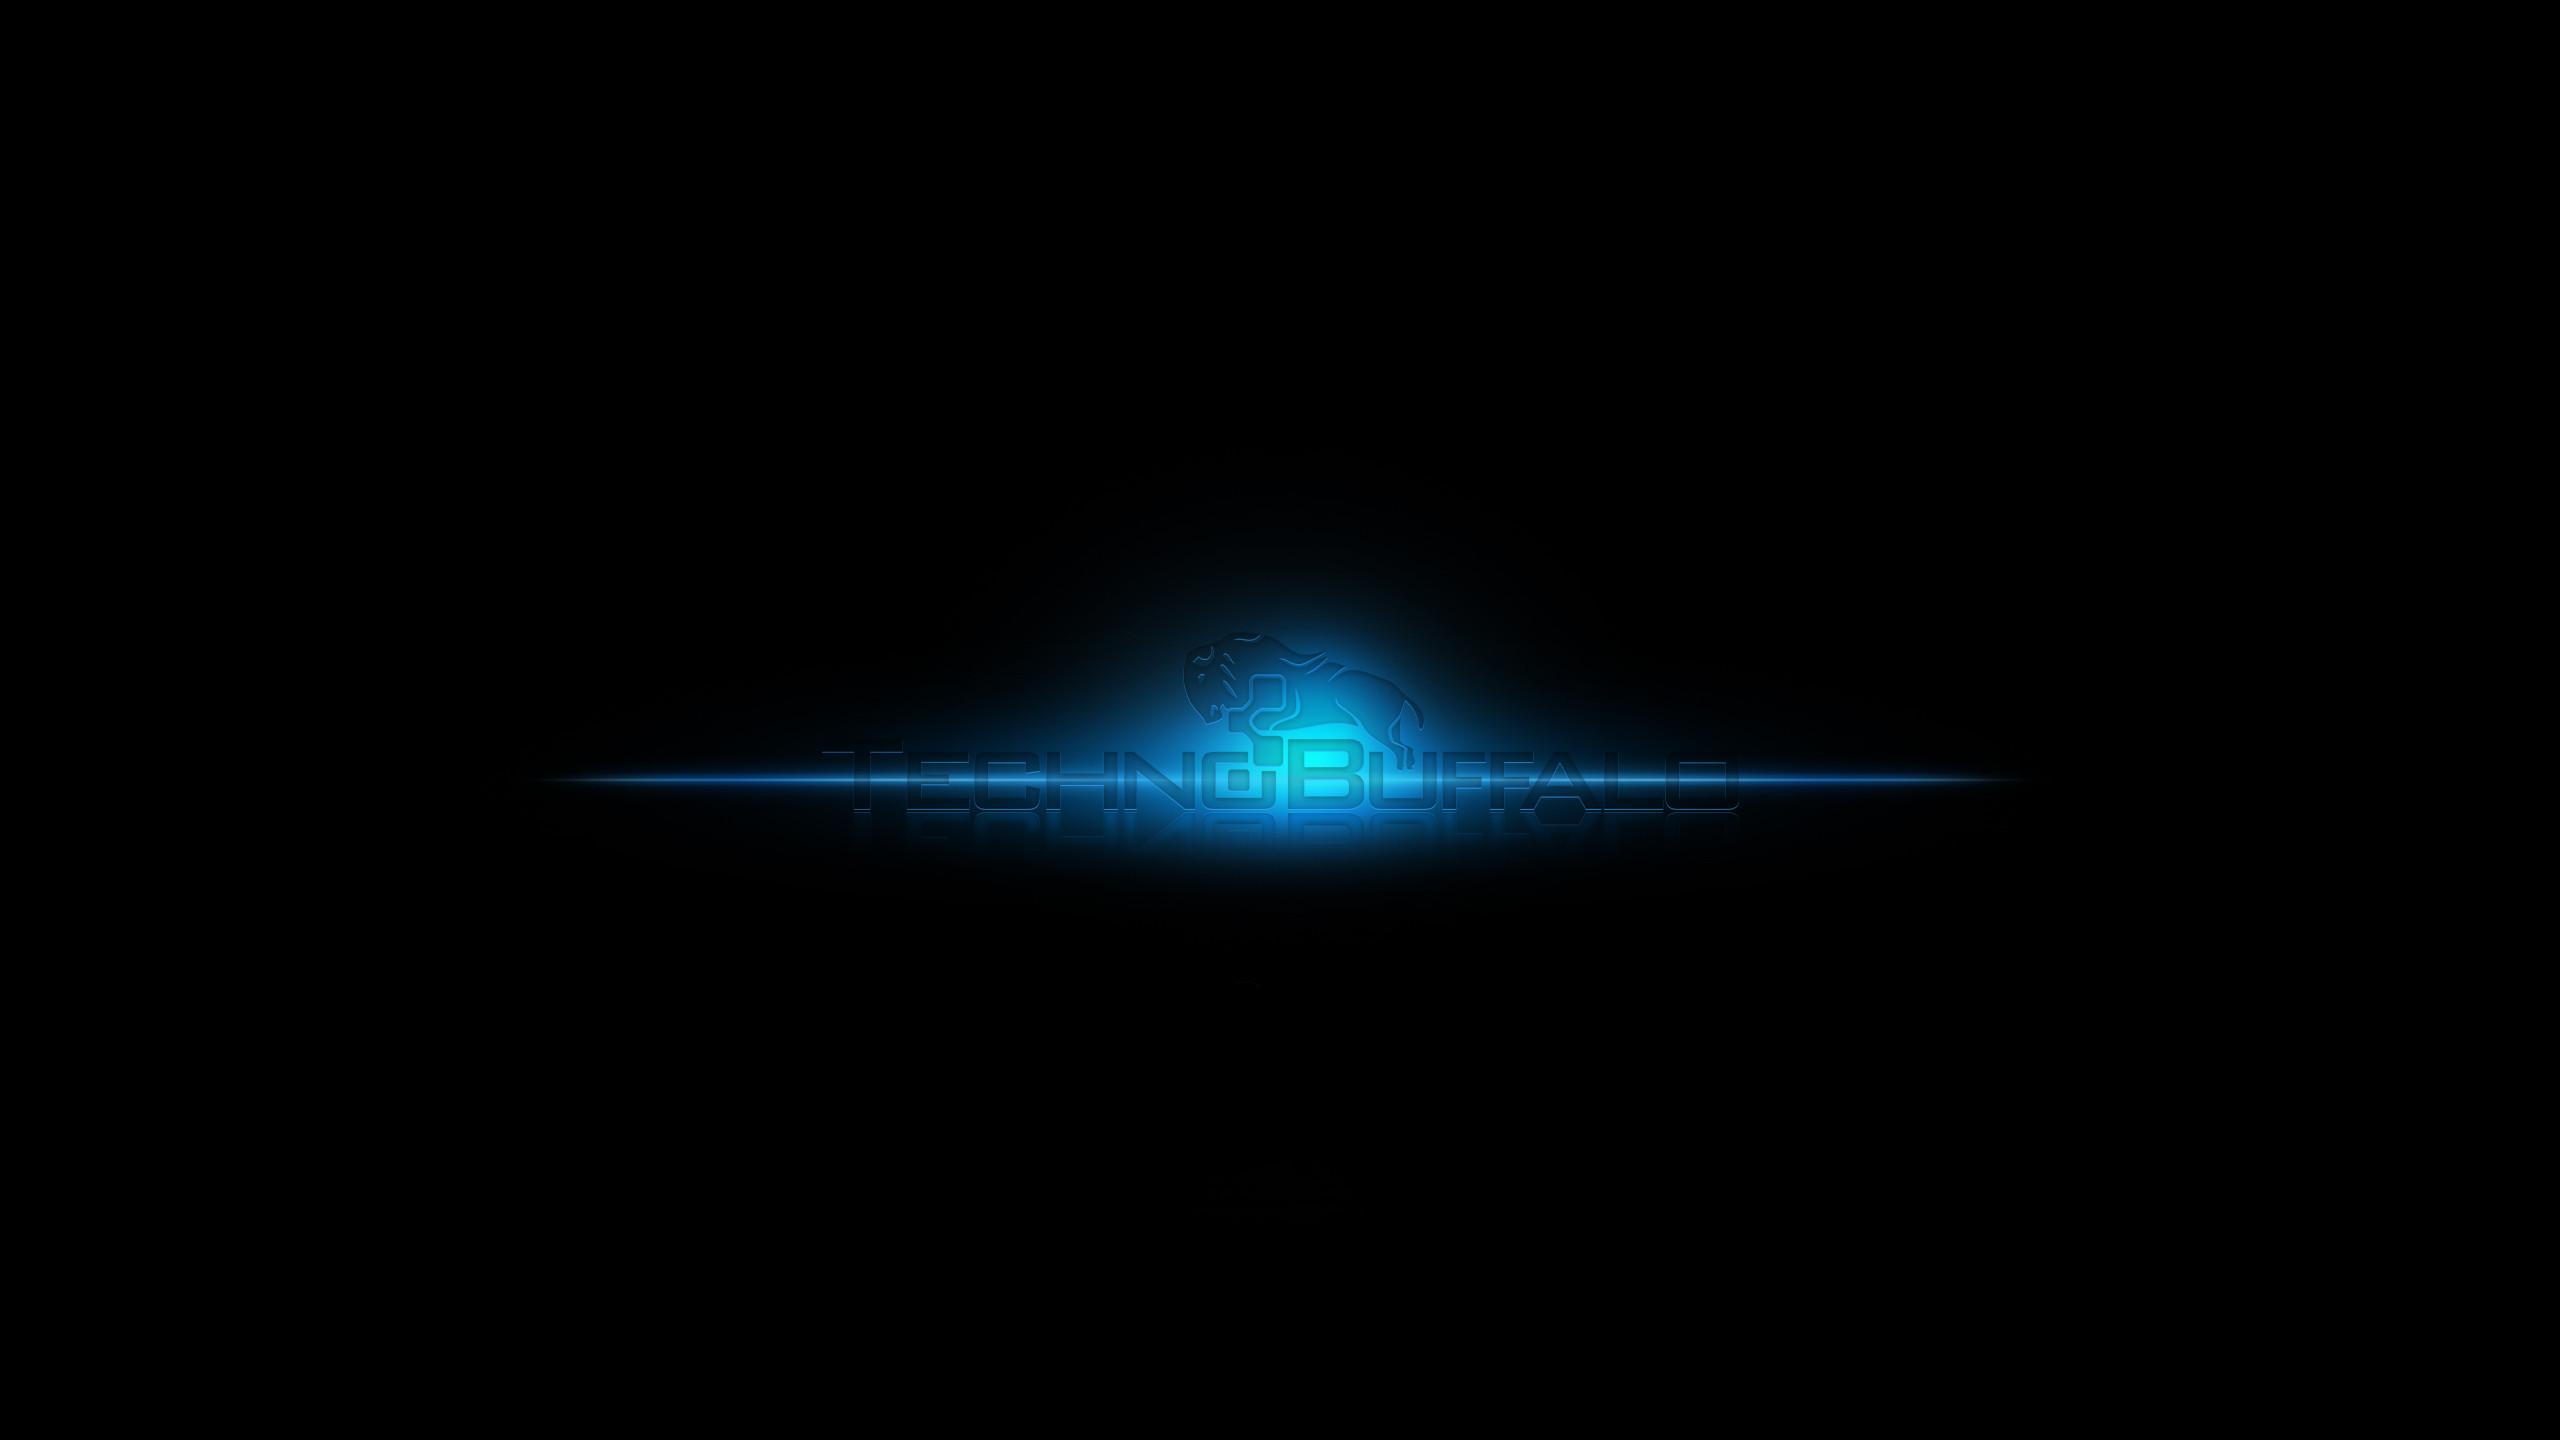 wallpaper technobuffalo blue wallpaper technobuffalo glow wallpaper .